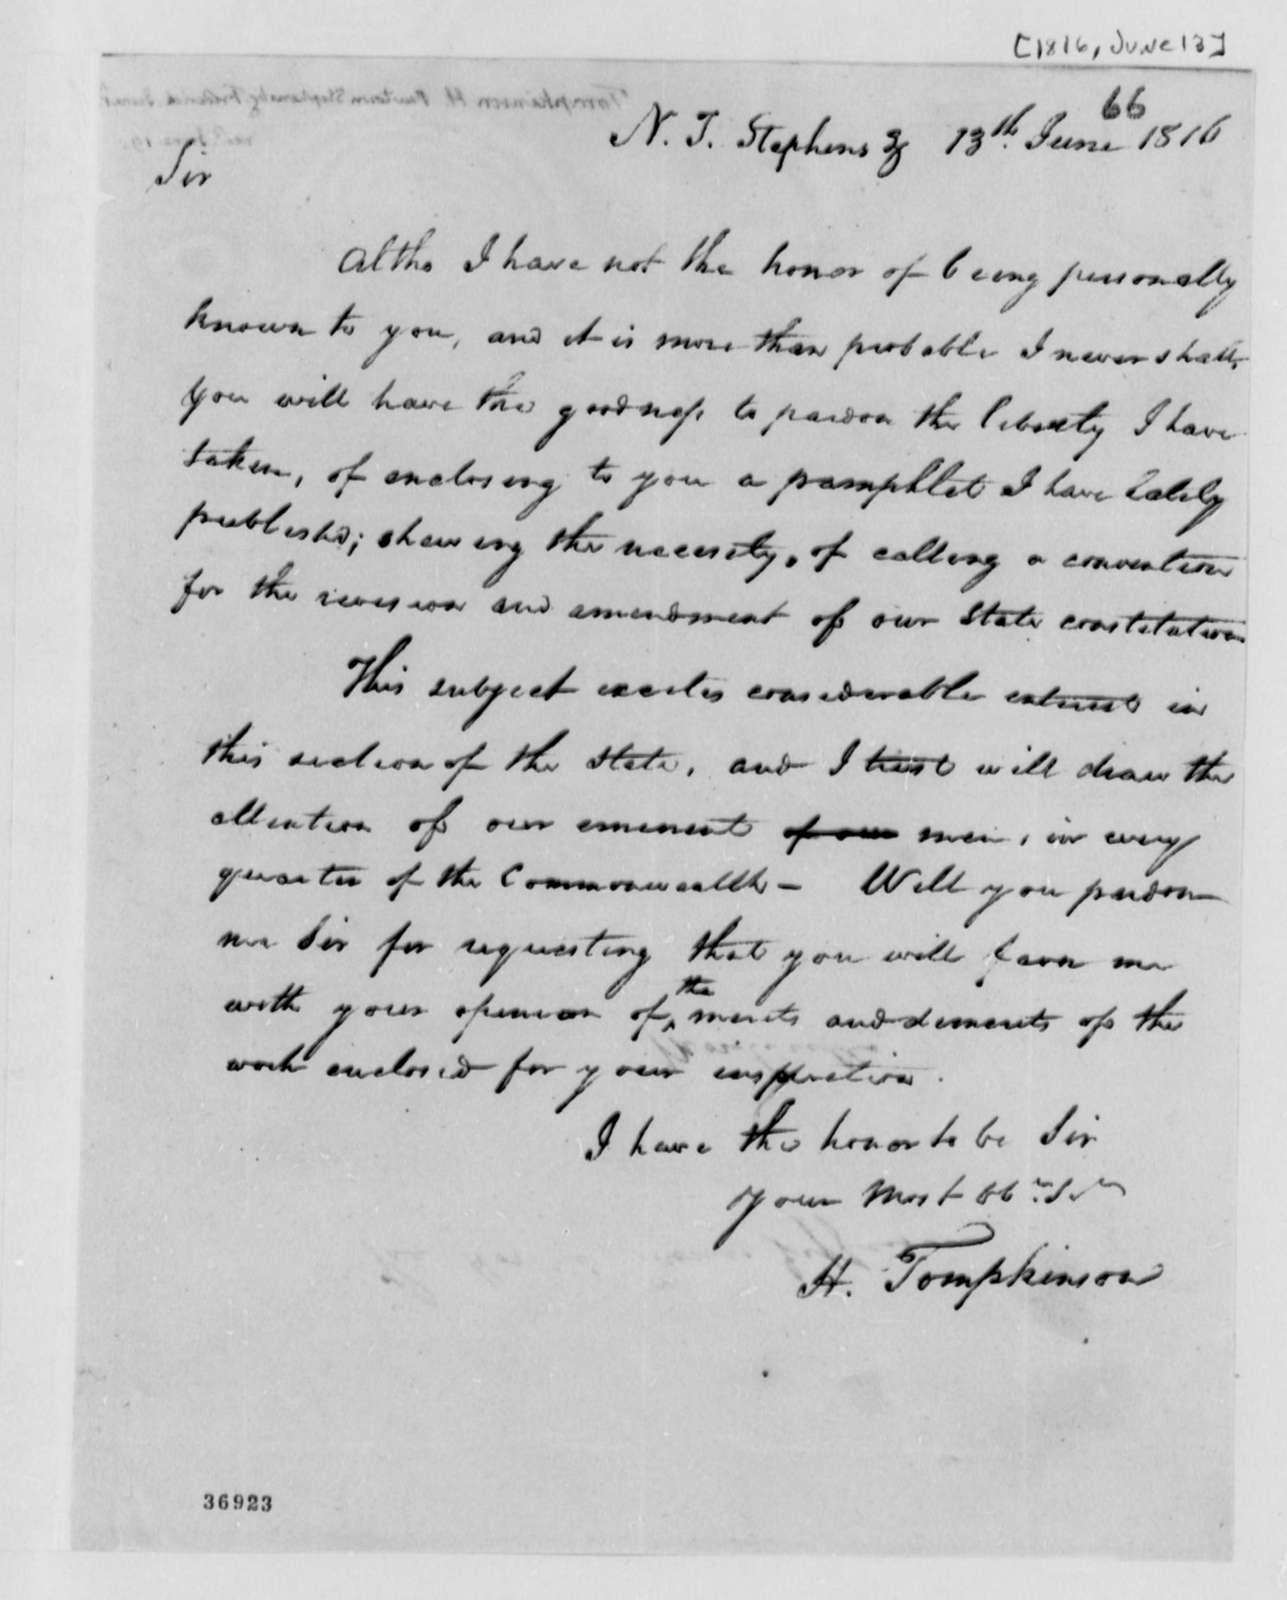 Samuel Kercheval to Thomas Jefferson, June 13, 1816